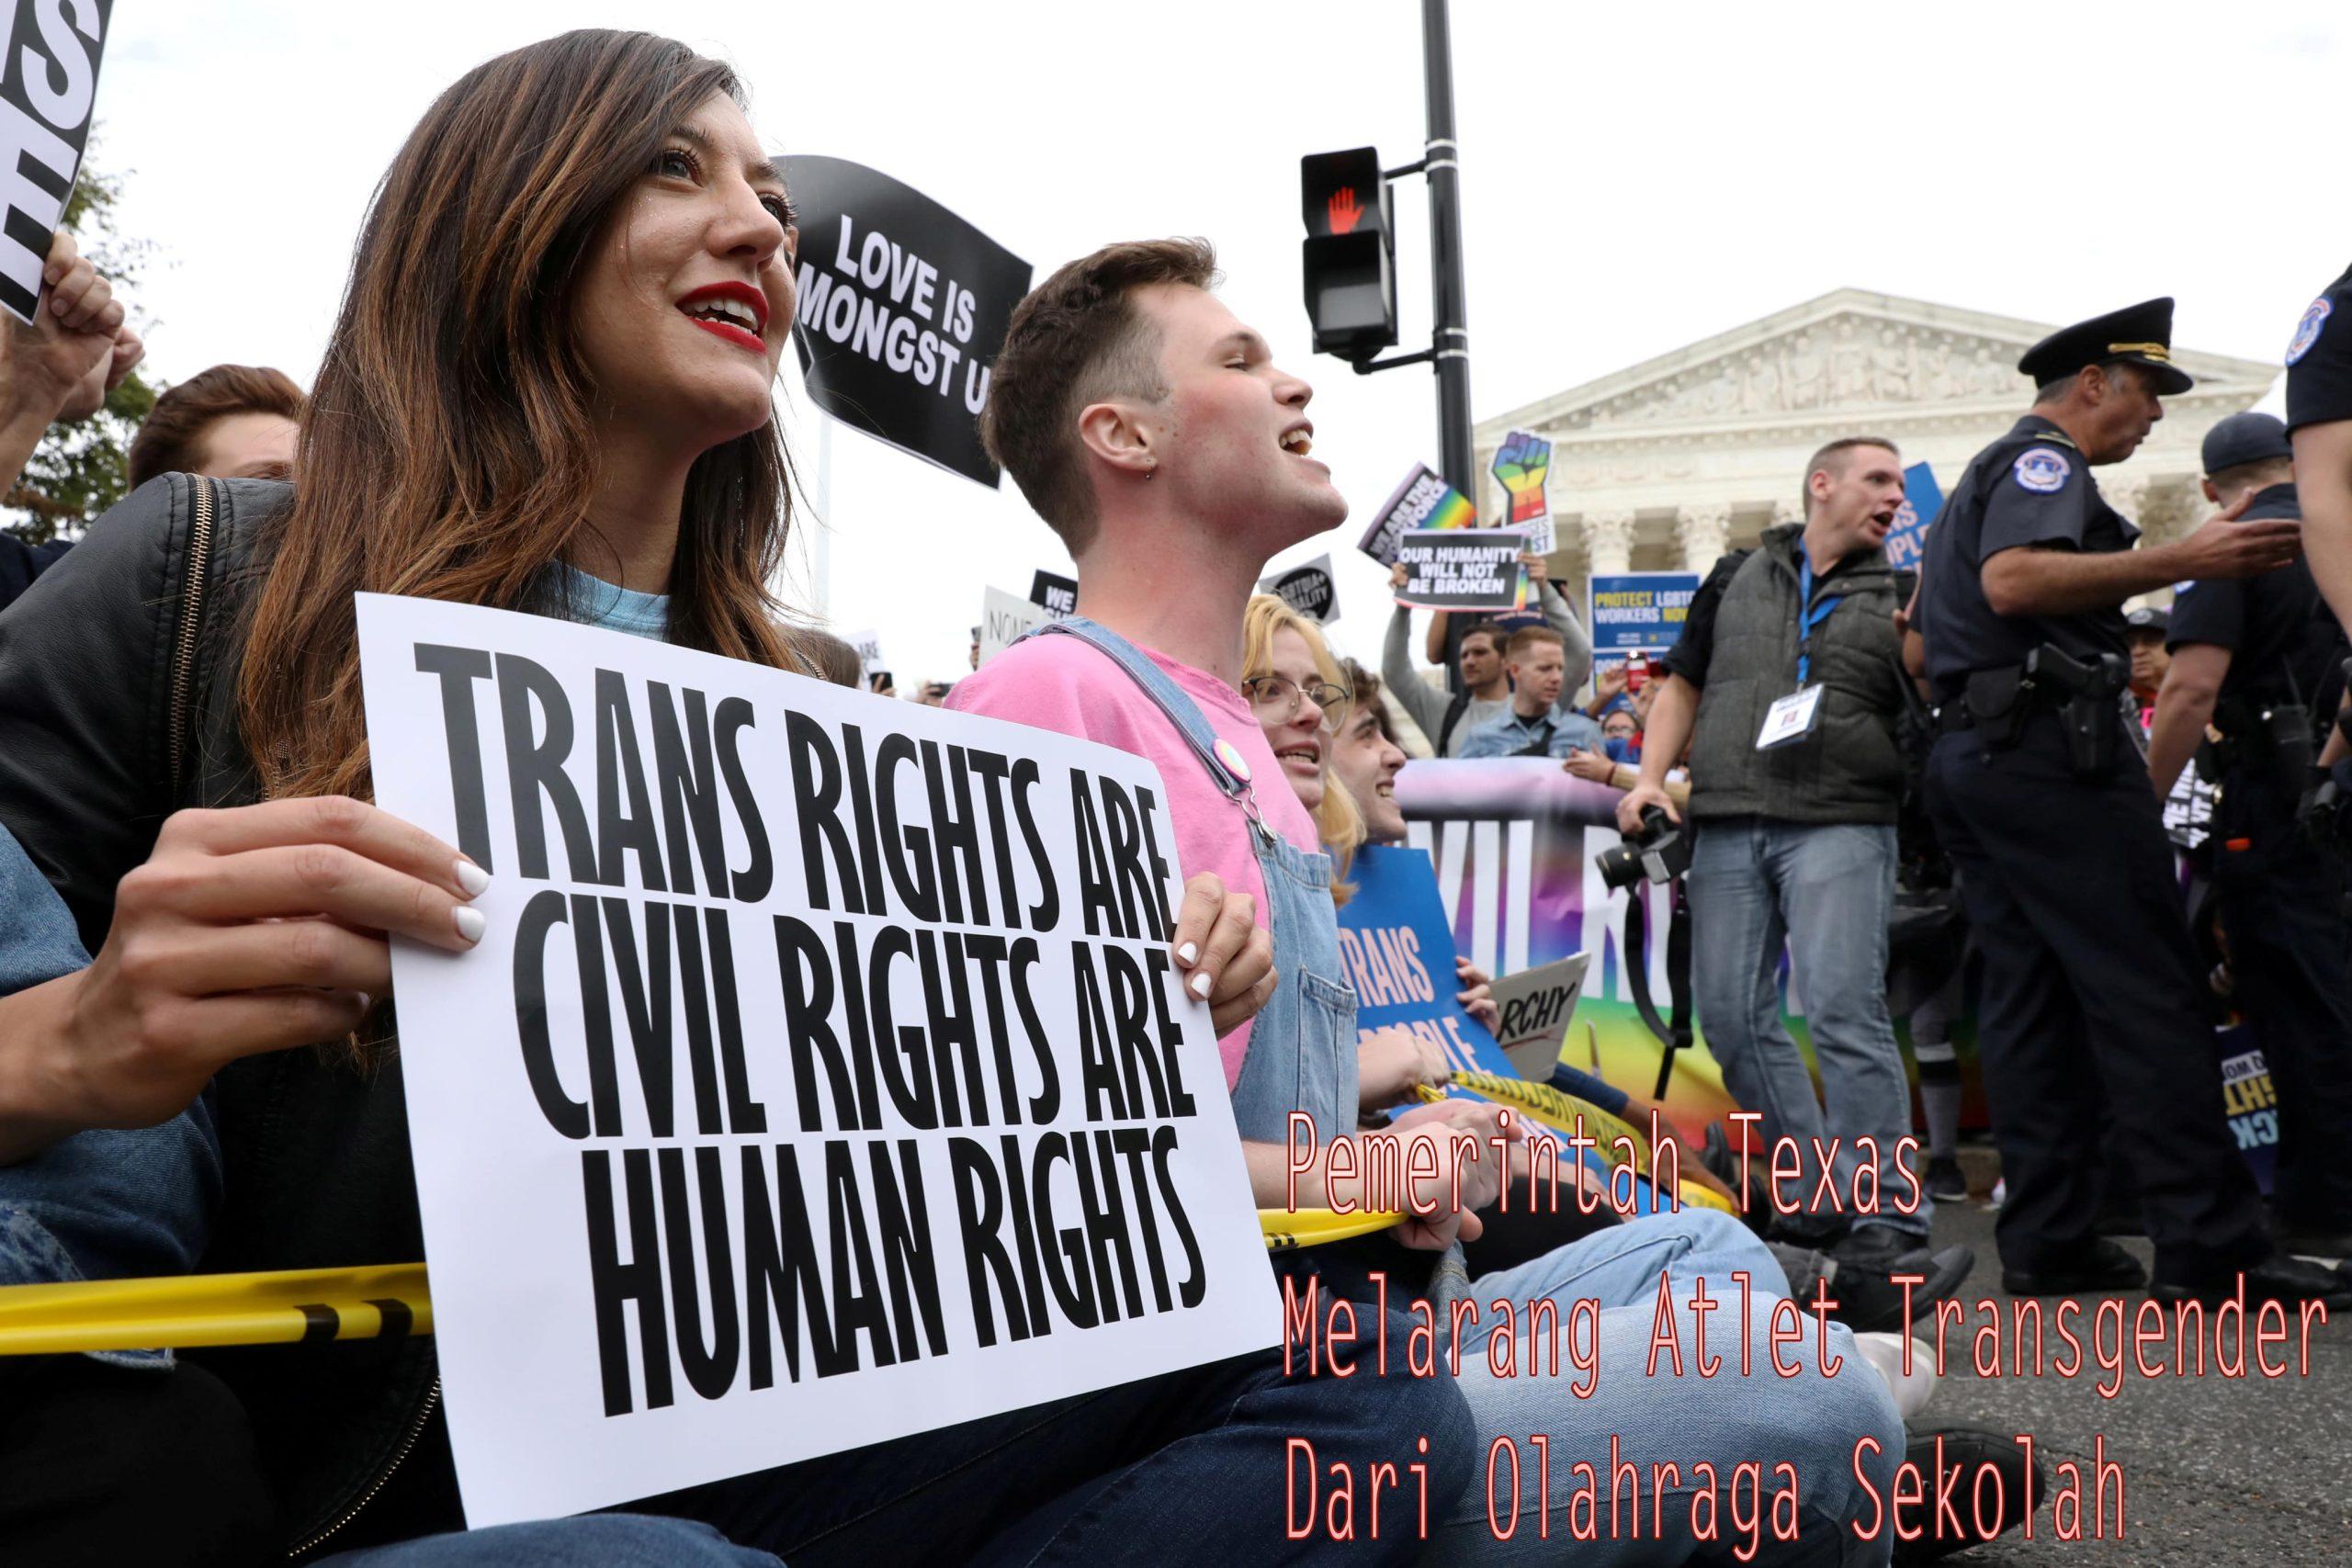 Pemerintah Texas Menandatangani Undang-Undang Larangan Atlet Transgender